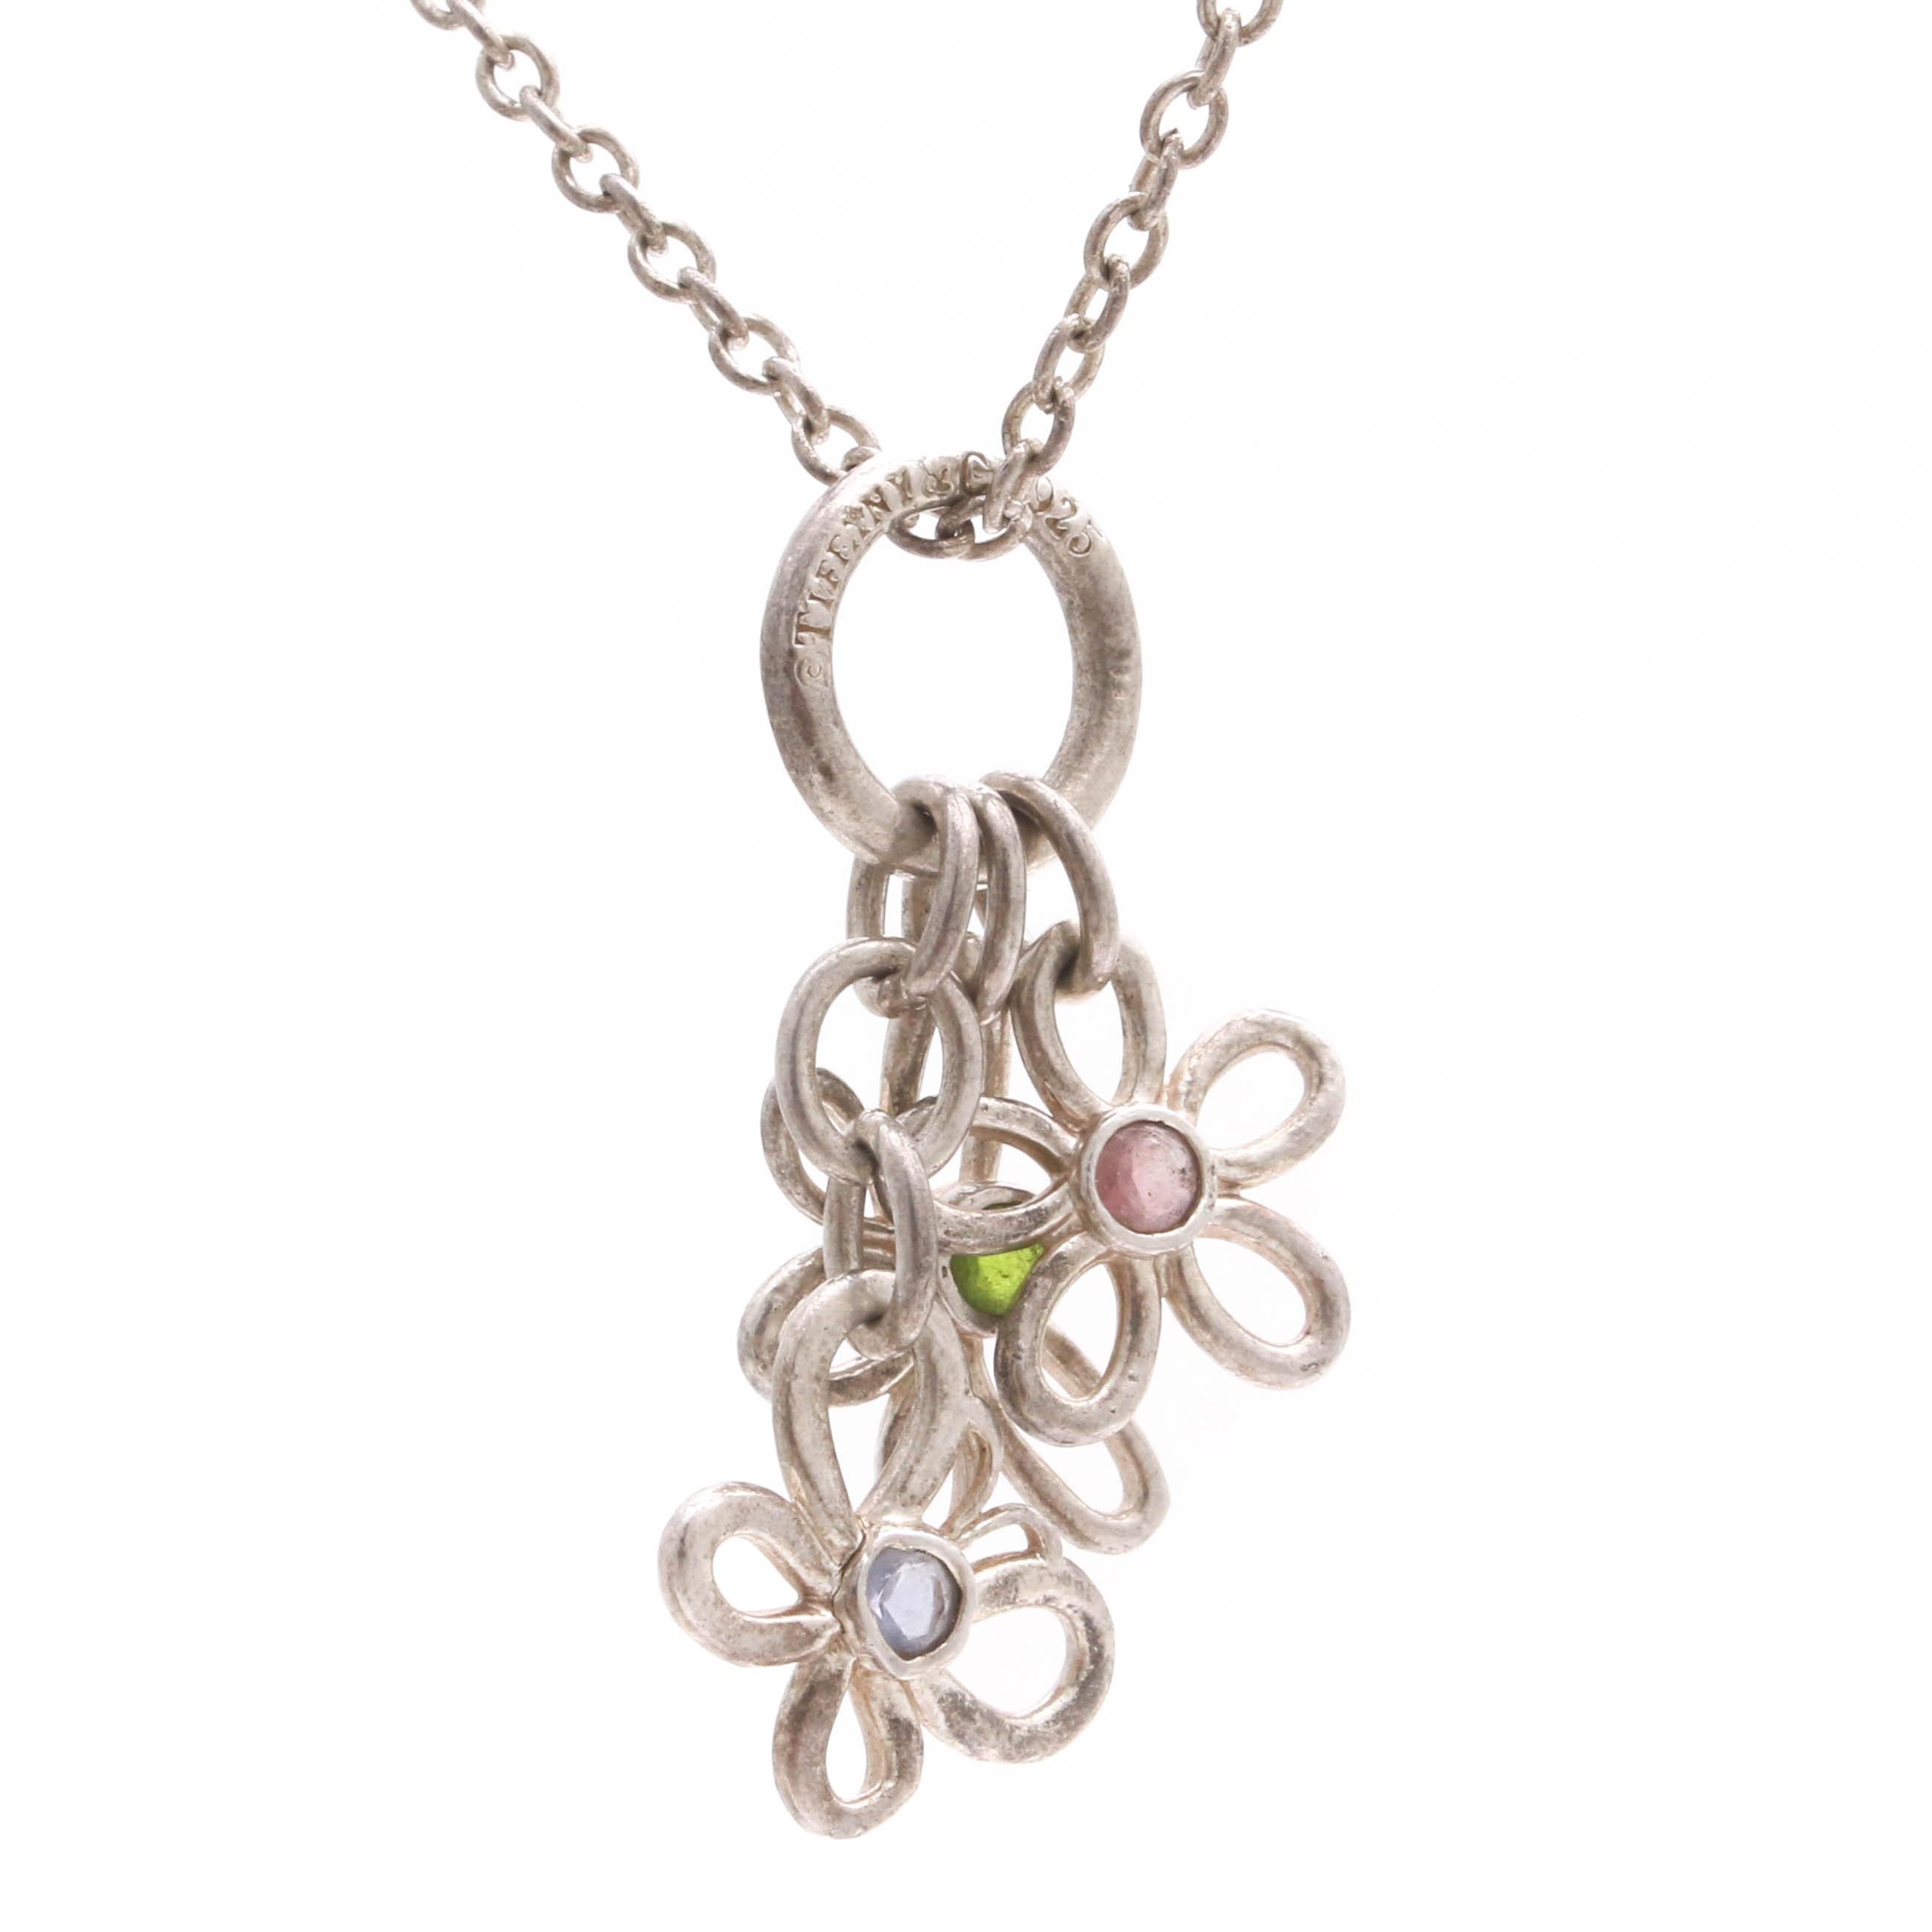 Tiffany & Co. Sterling Silver Garnet, Peridot, and Tanzanite Necklace